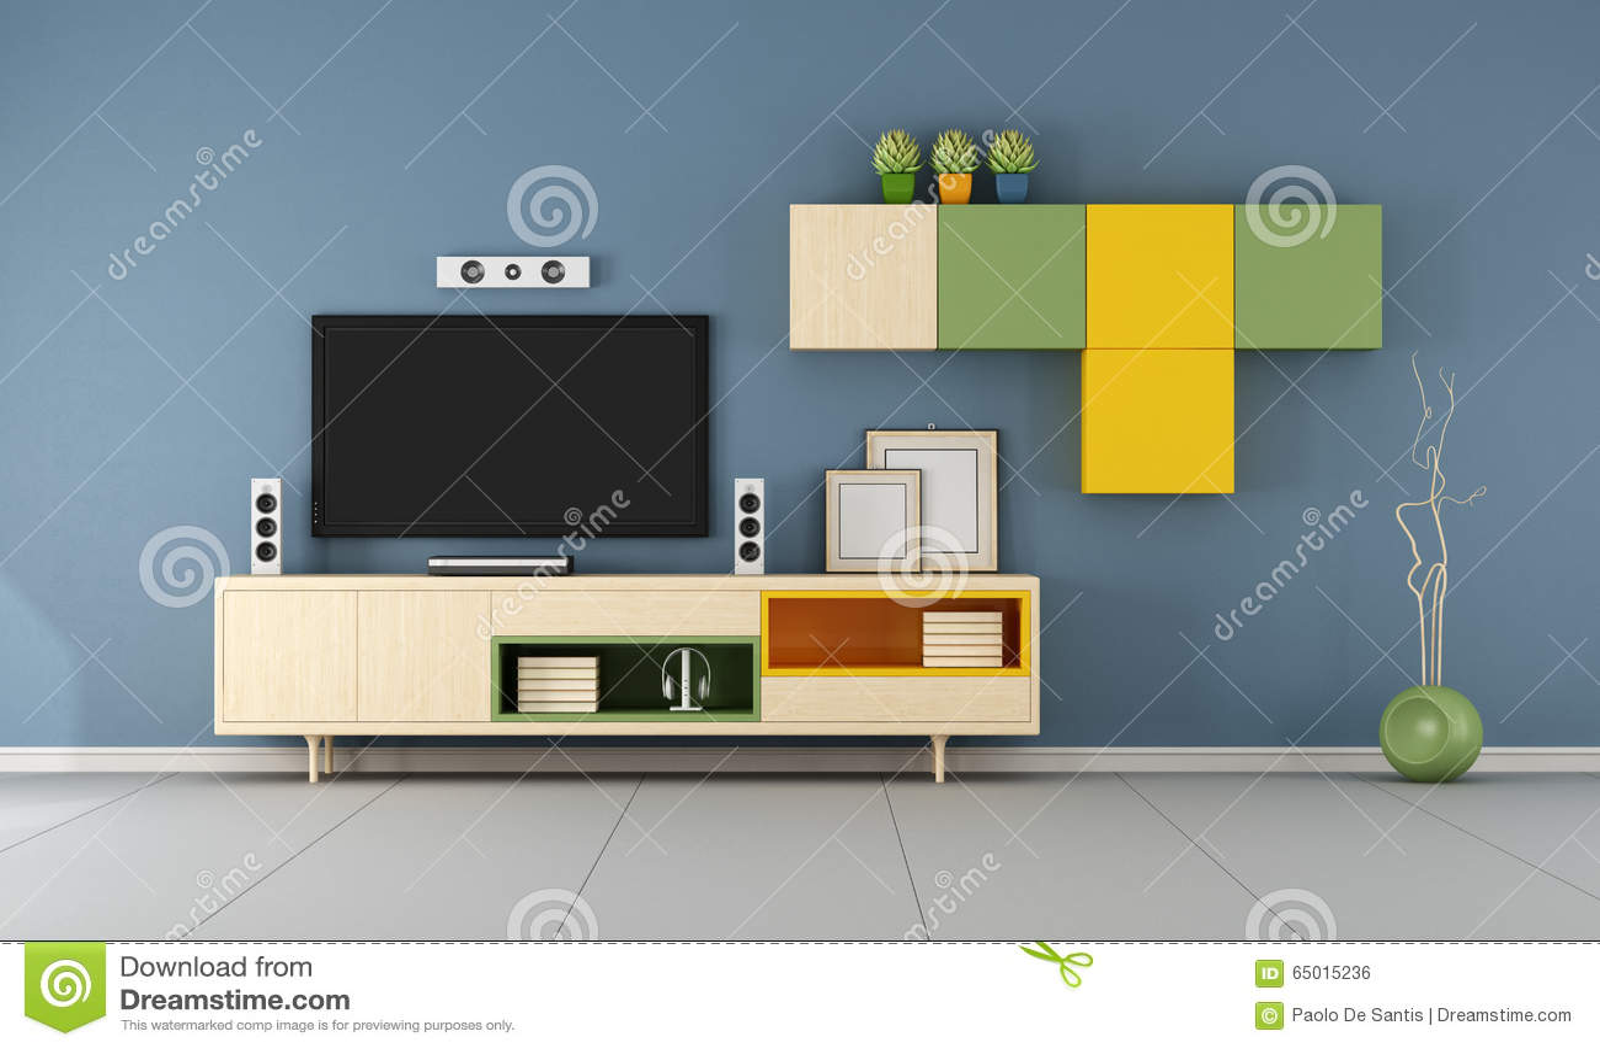 Contemporary Tv Wall Unit In Ablue Room Stock Illustration Illustration Of Green Blue 65015236